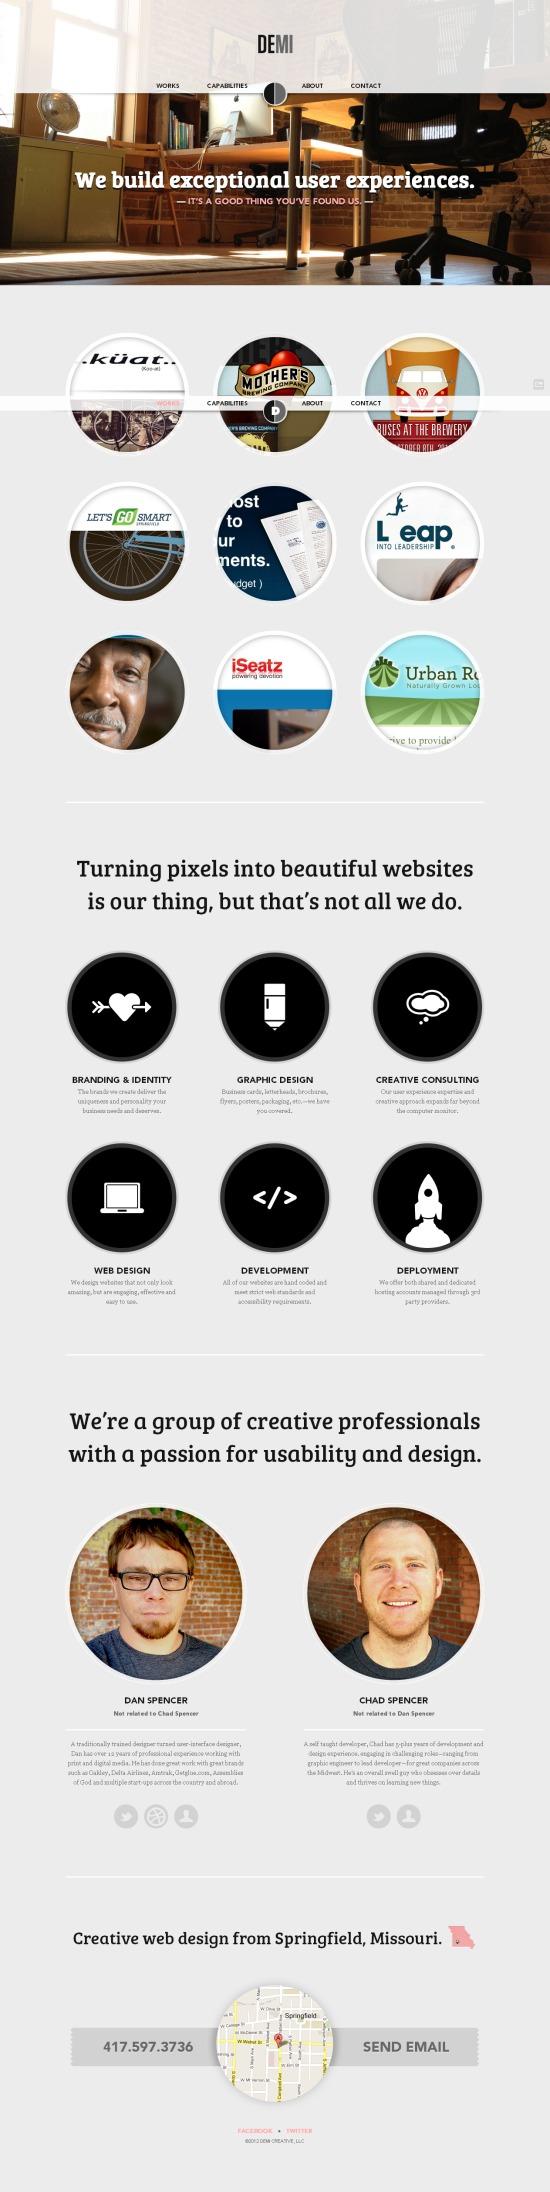 Http Demicreative Com Creative Web Design Web Design Beautiful Websites